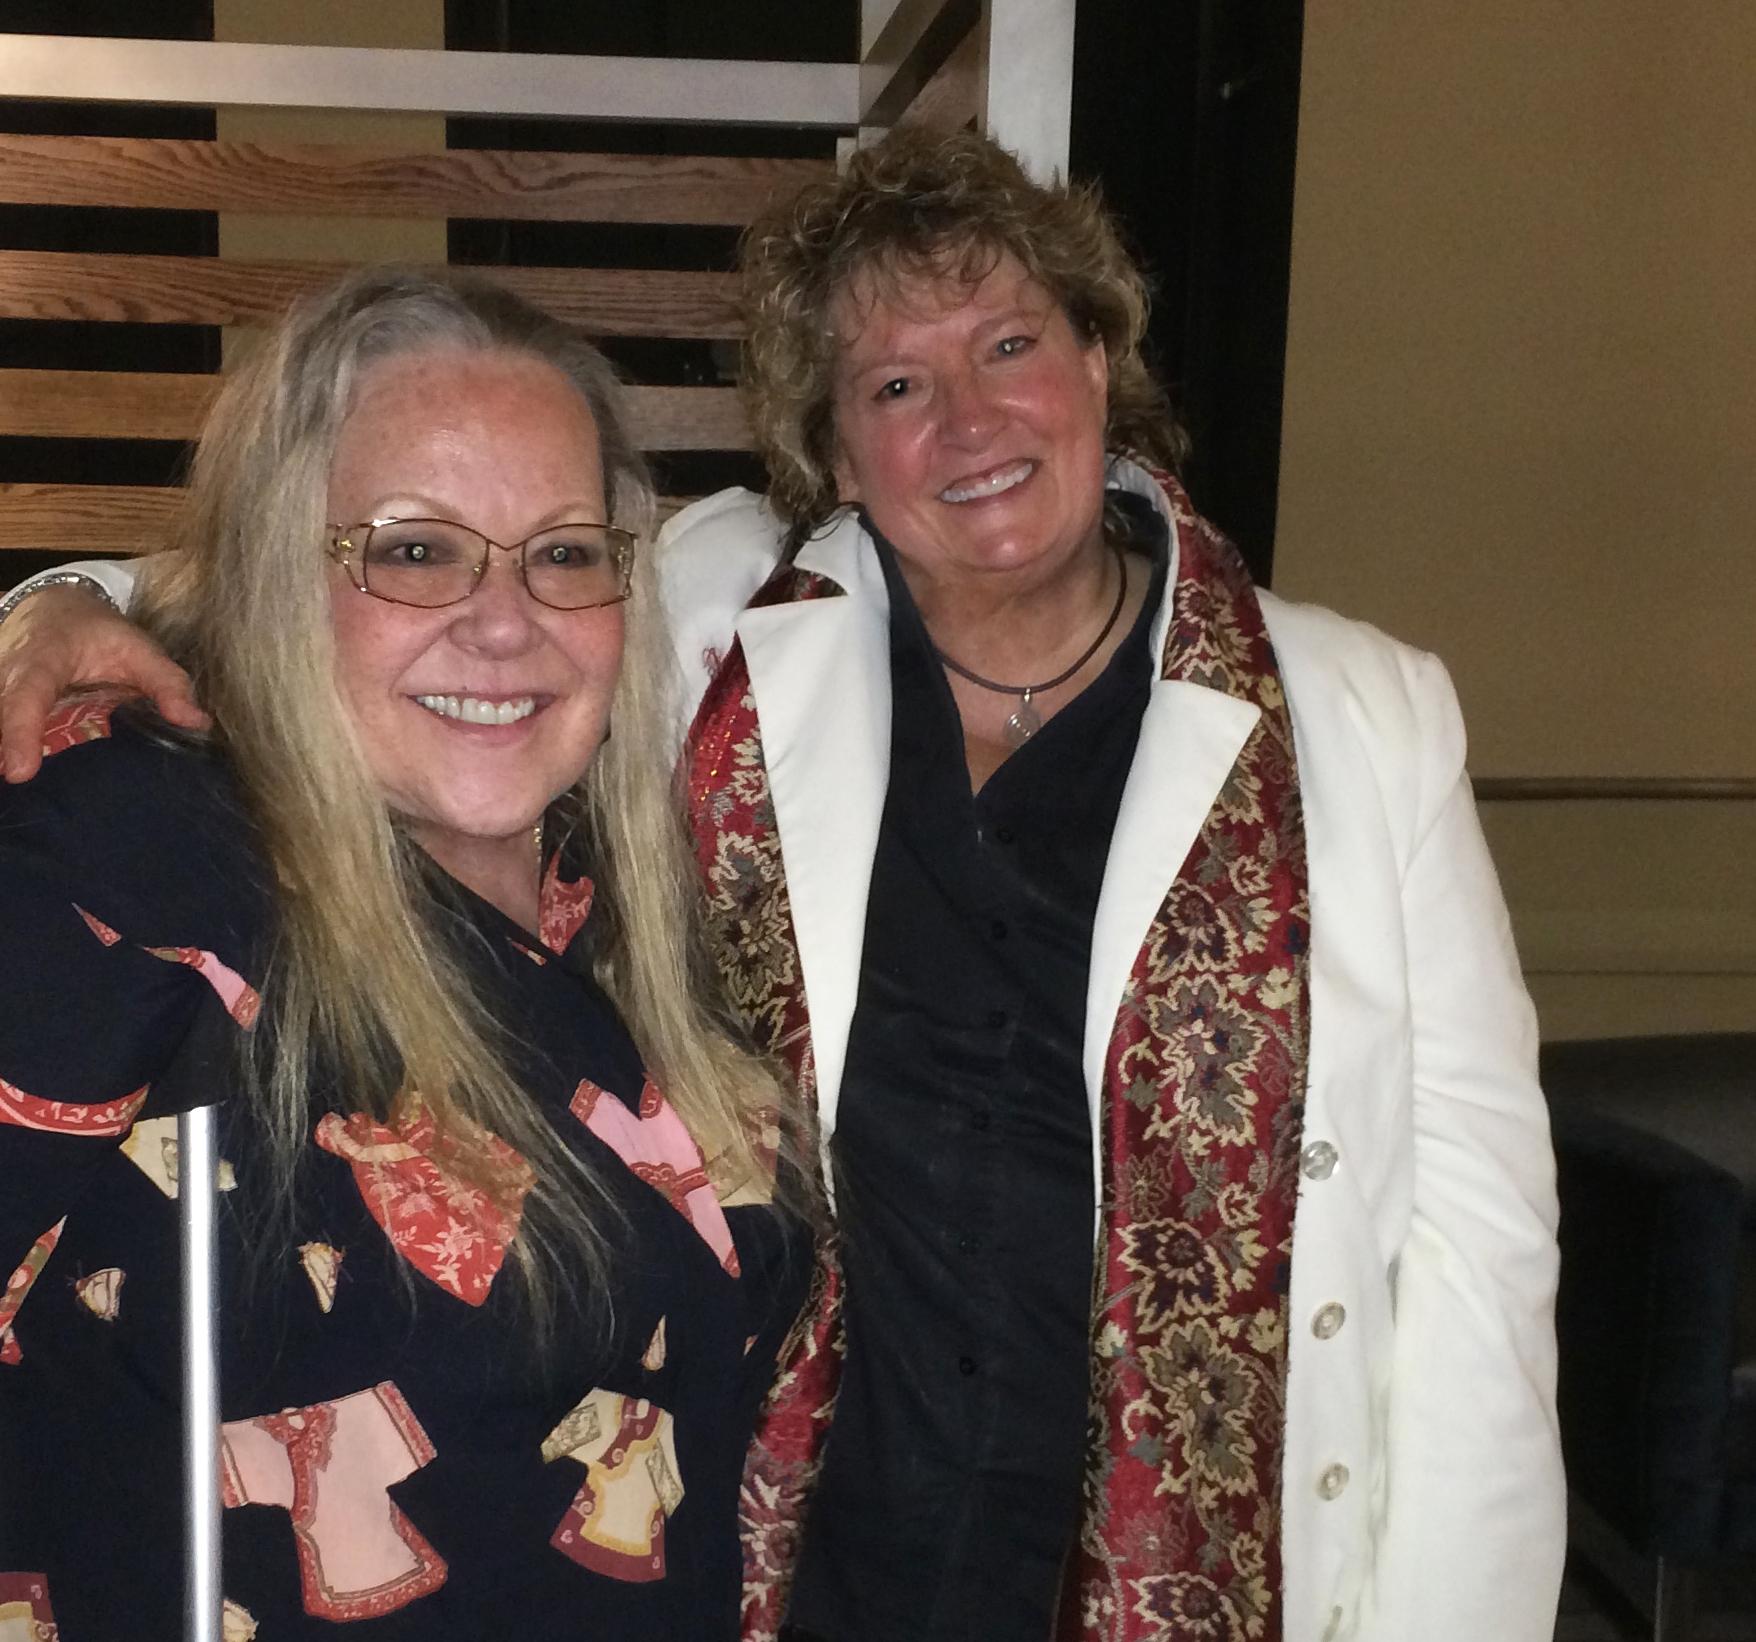 Suede, postshow with Master Rebecca Parris